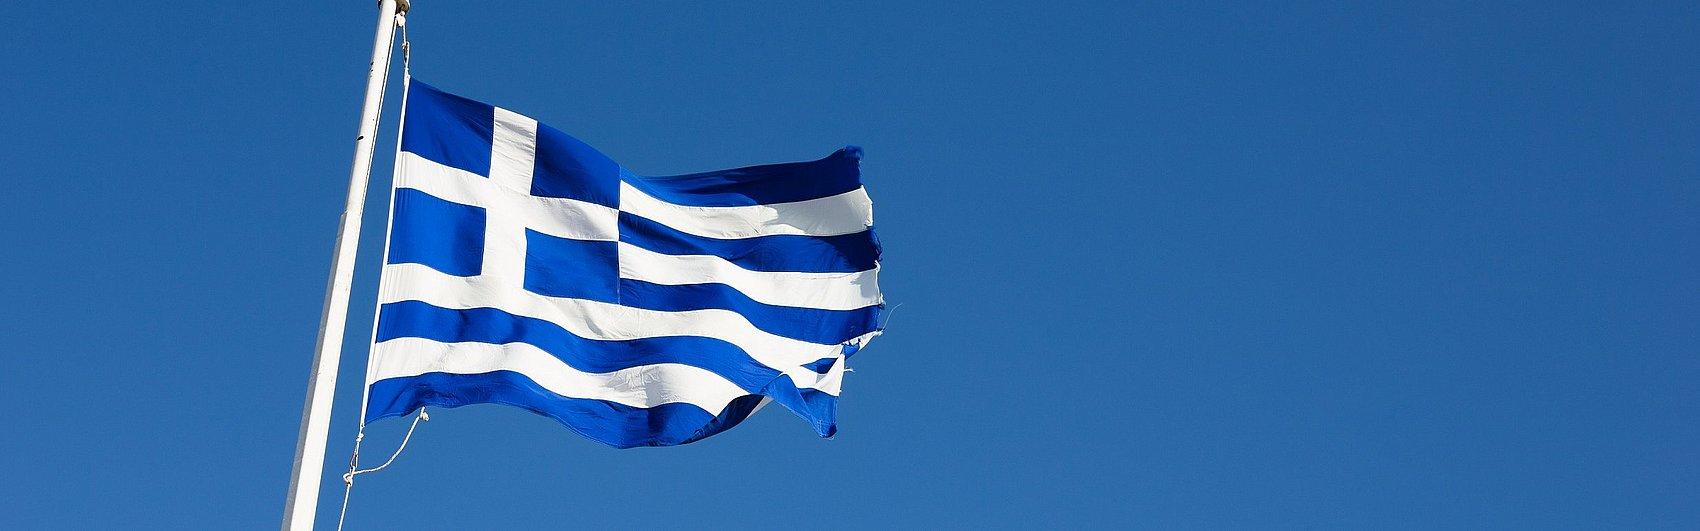 csm_Greece_4c8f141a8c.jpg